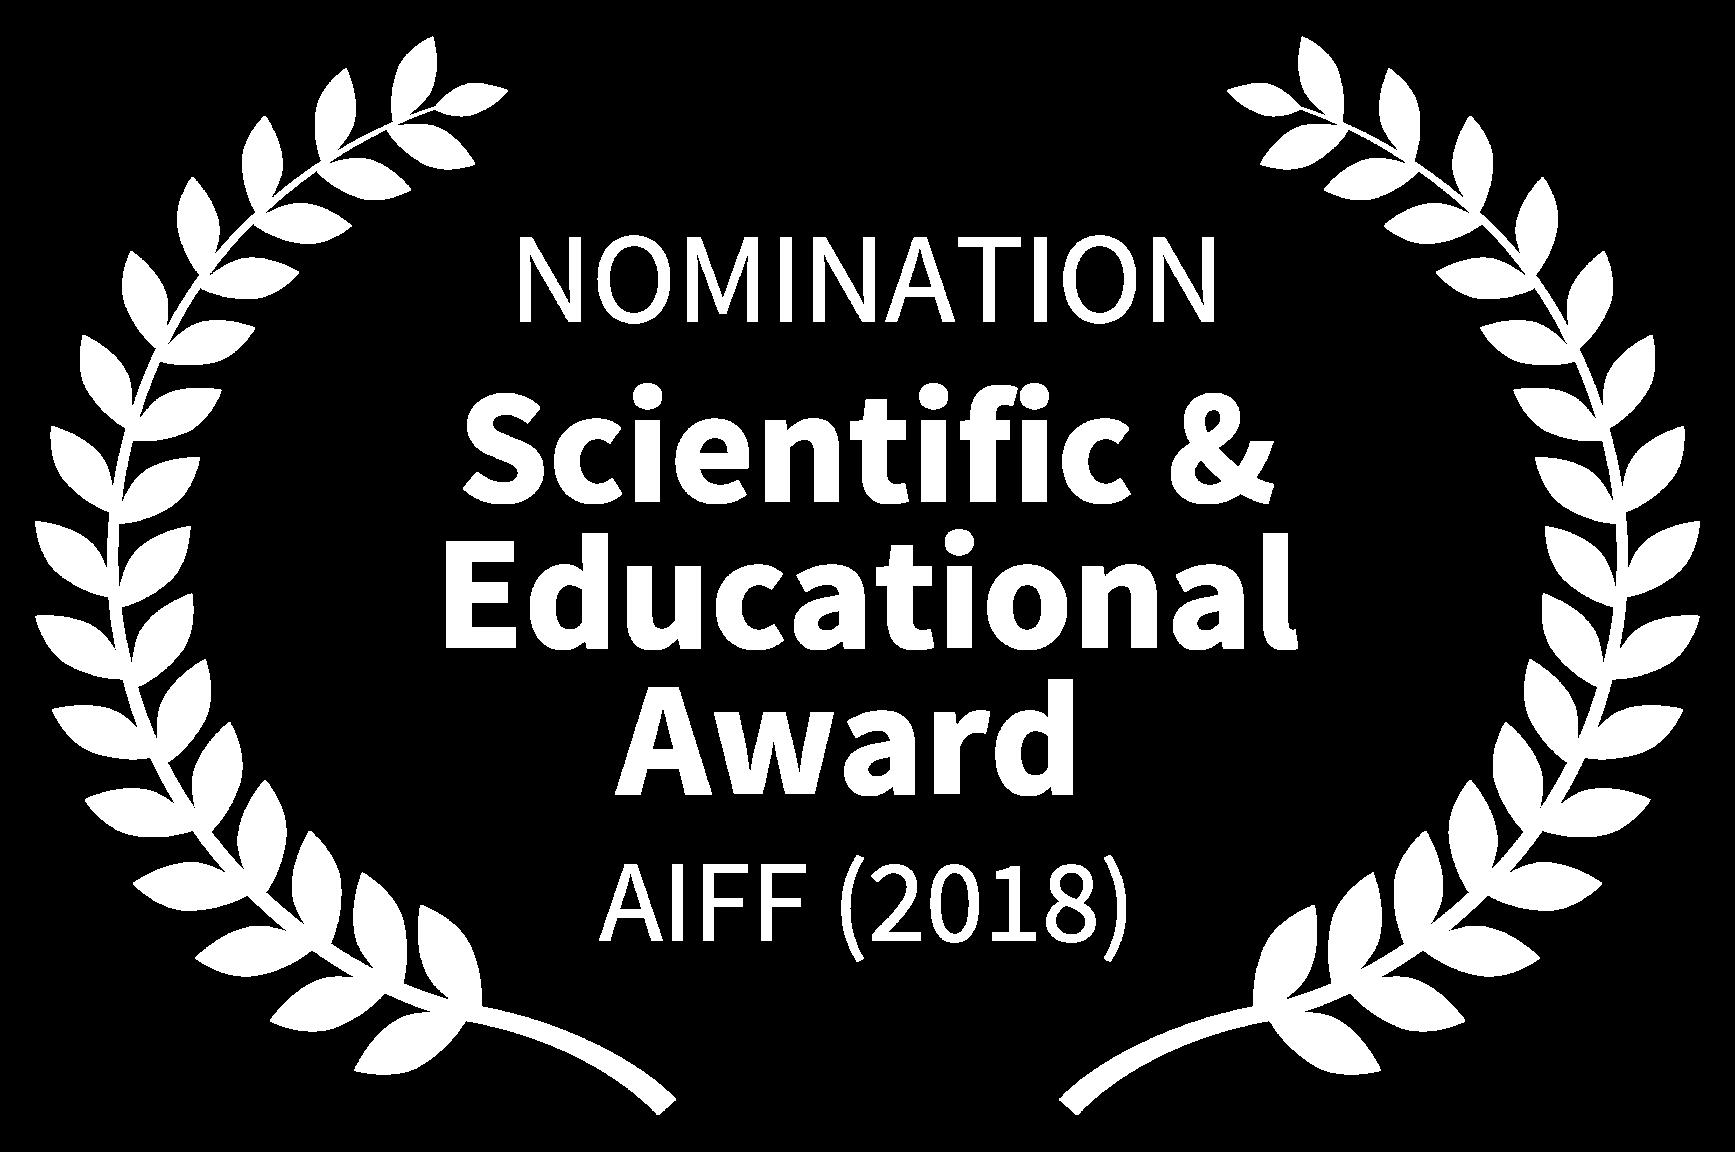 NOMINATION - Scientific Educational Award - AIFF 2018